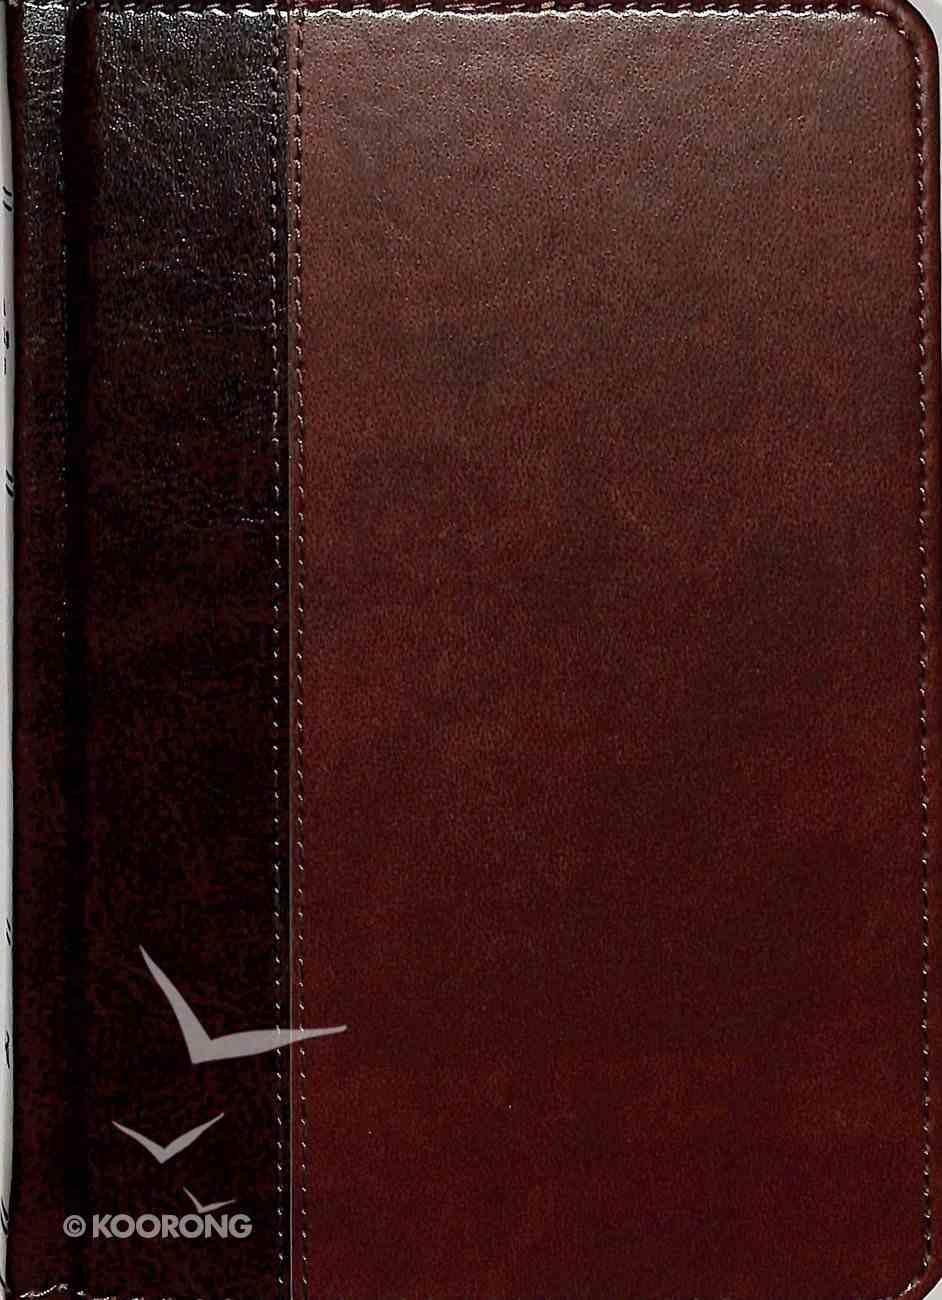 ESV Psalms Brown/Walnut Timeless Design (Black Letter Edition) Hardback